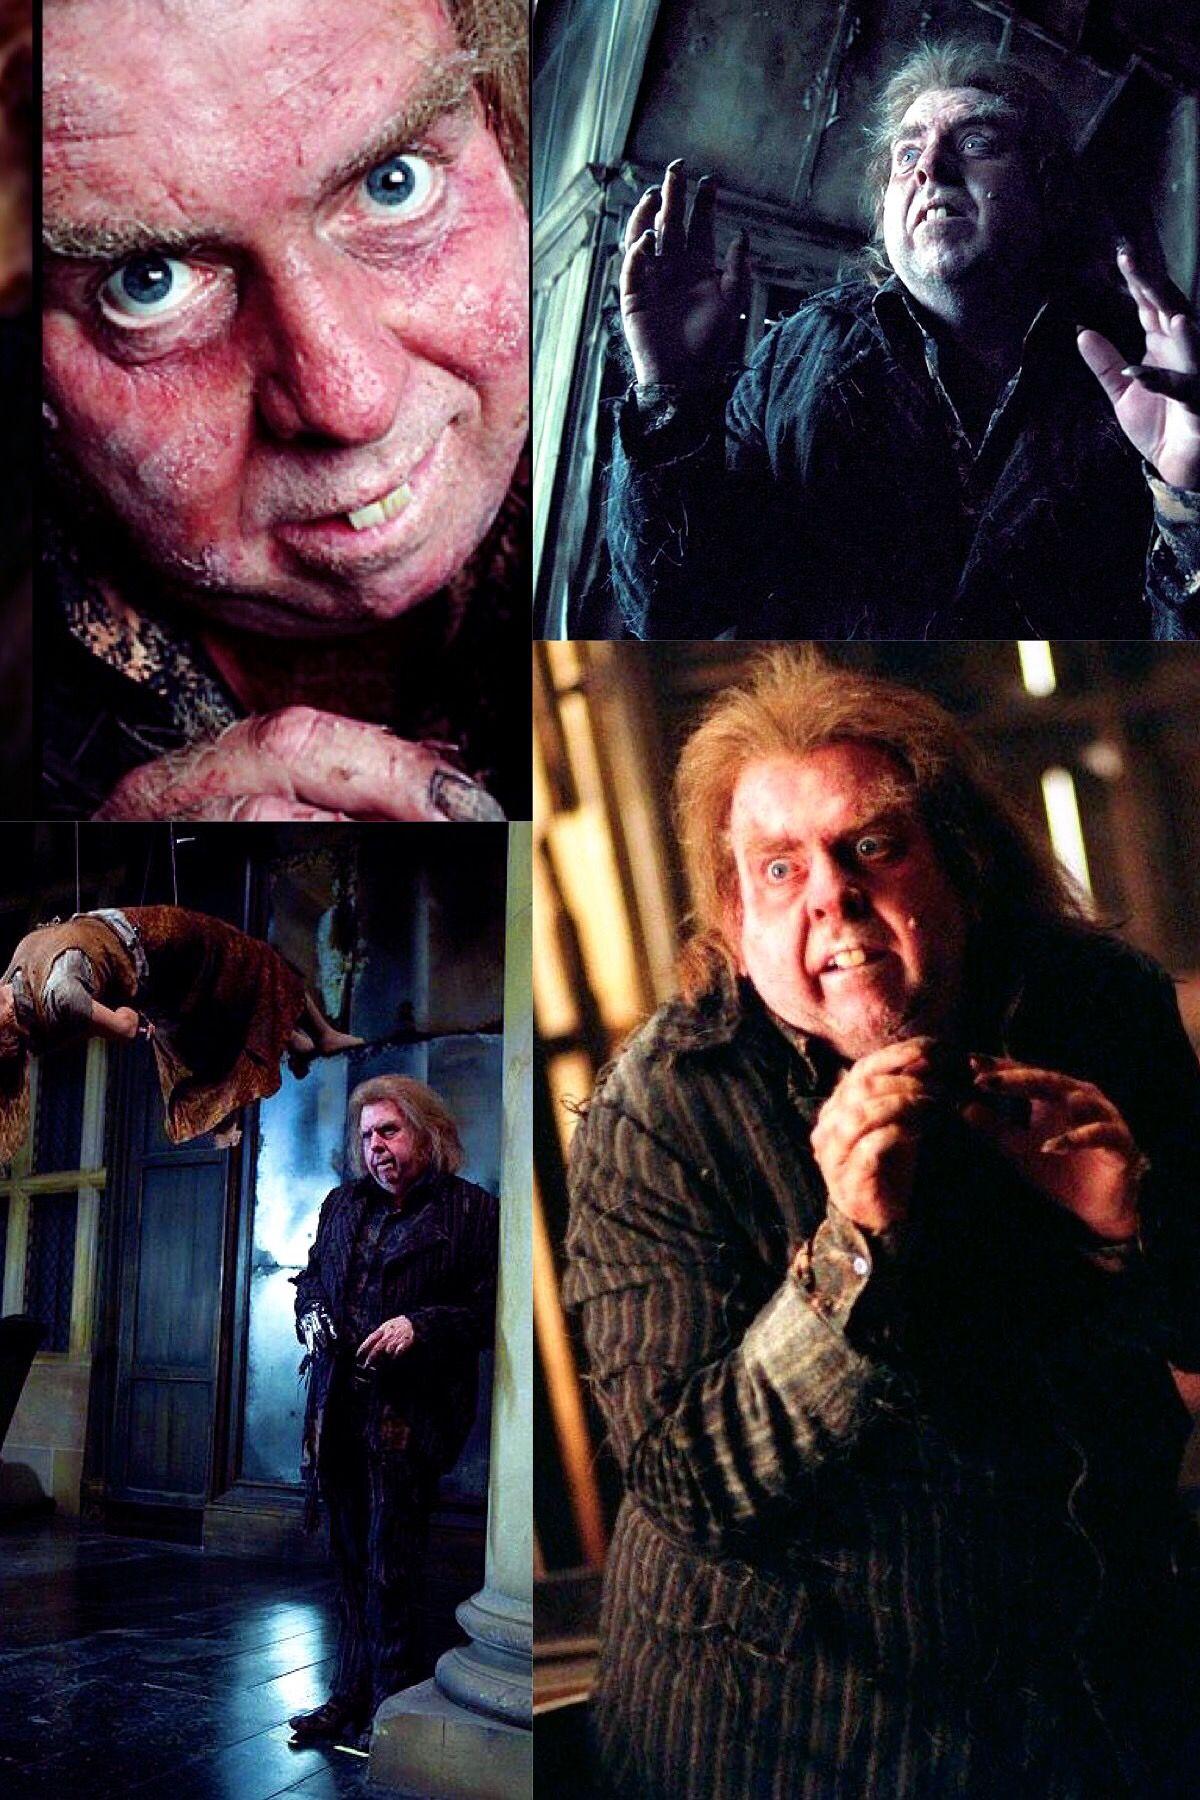 Peter Pettigrew Harry Potter Drawings Peter Pettigrew James Potter